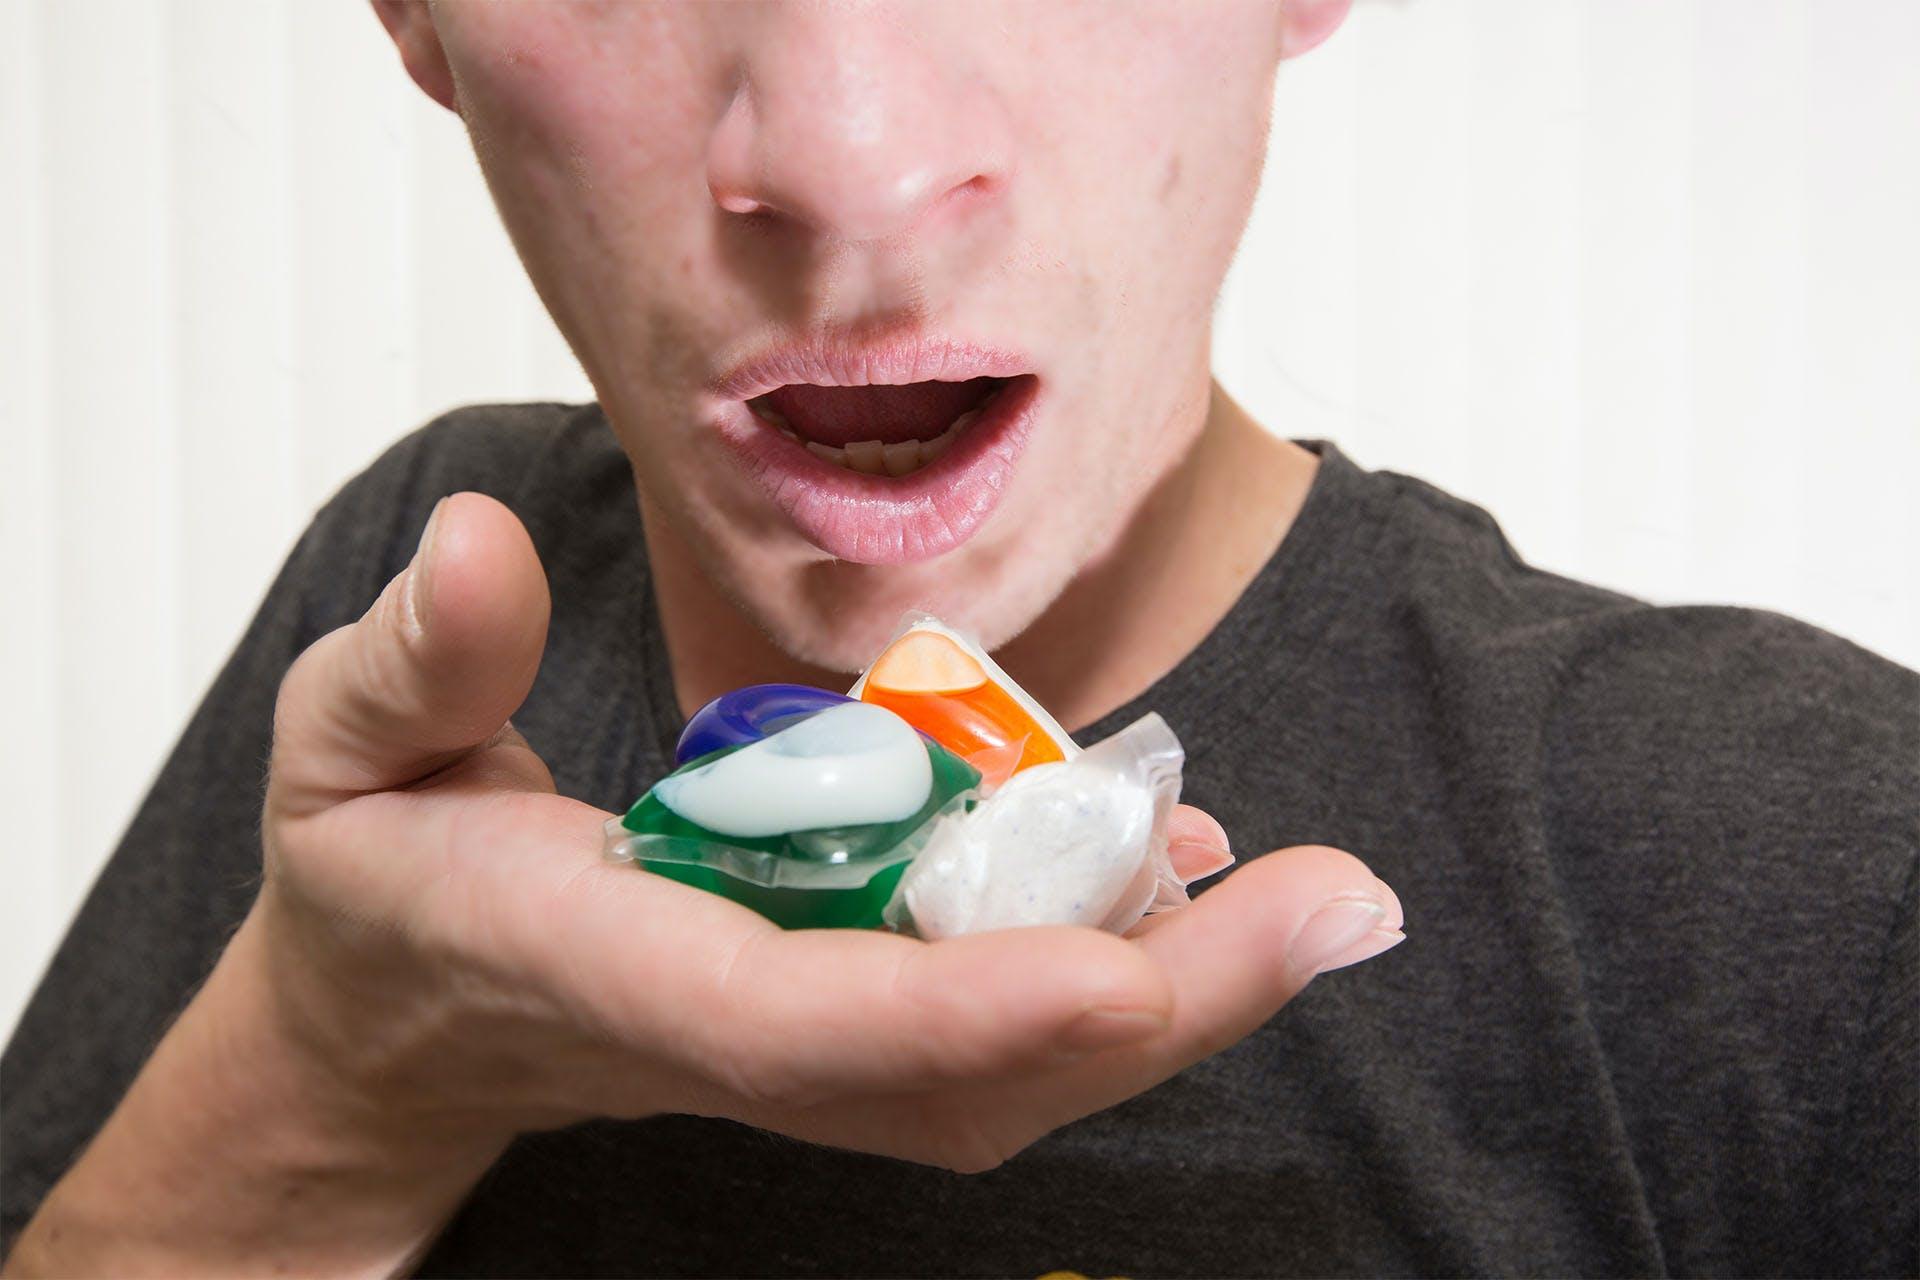 person holding detergent pods for the tide pod social media challenge